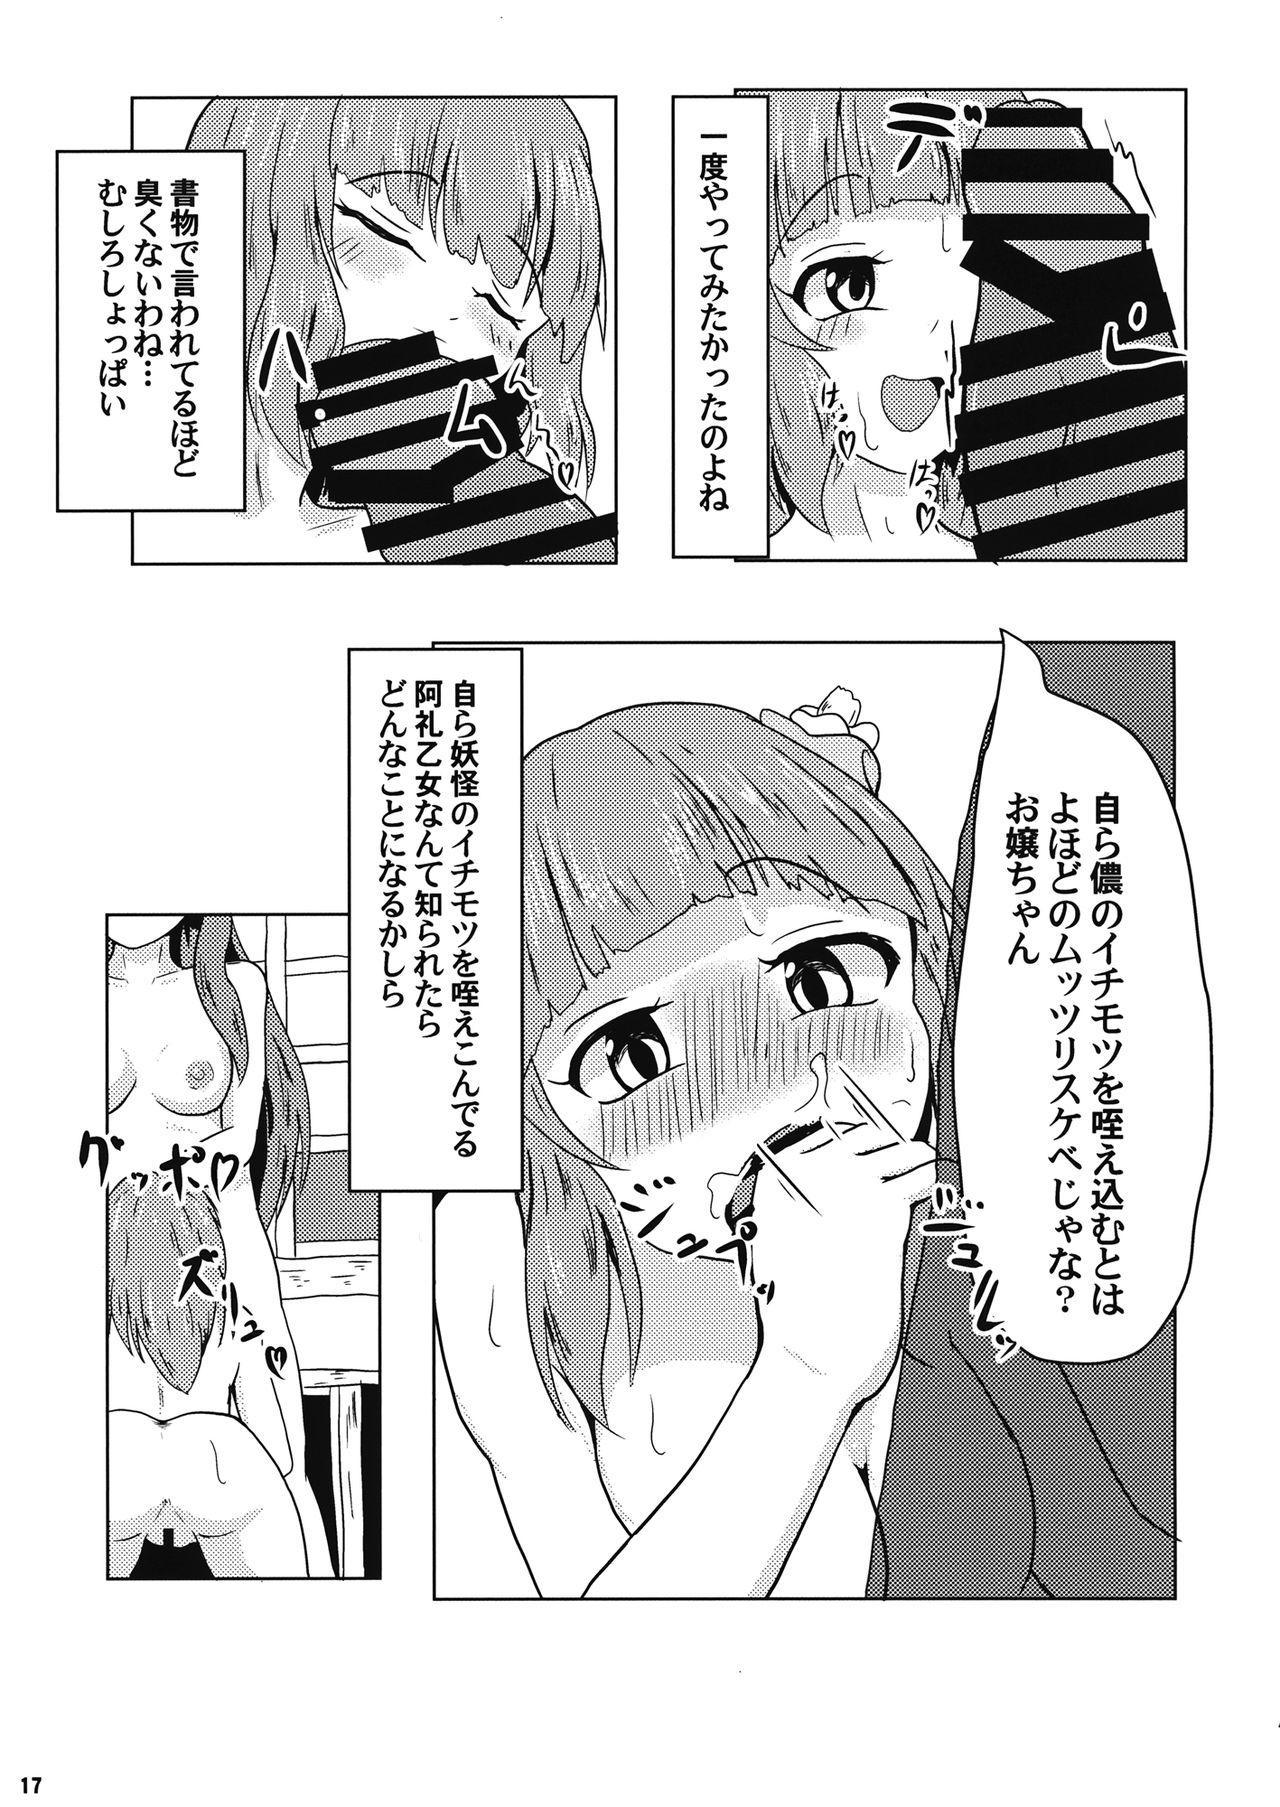 Ochiru Otome to Bakedanuki 17